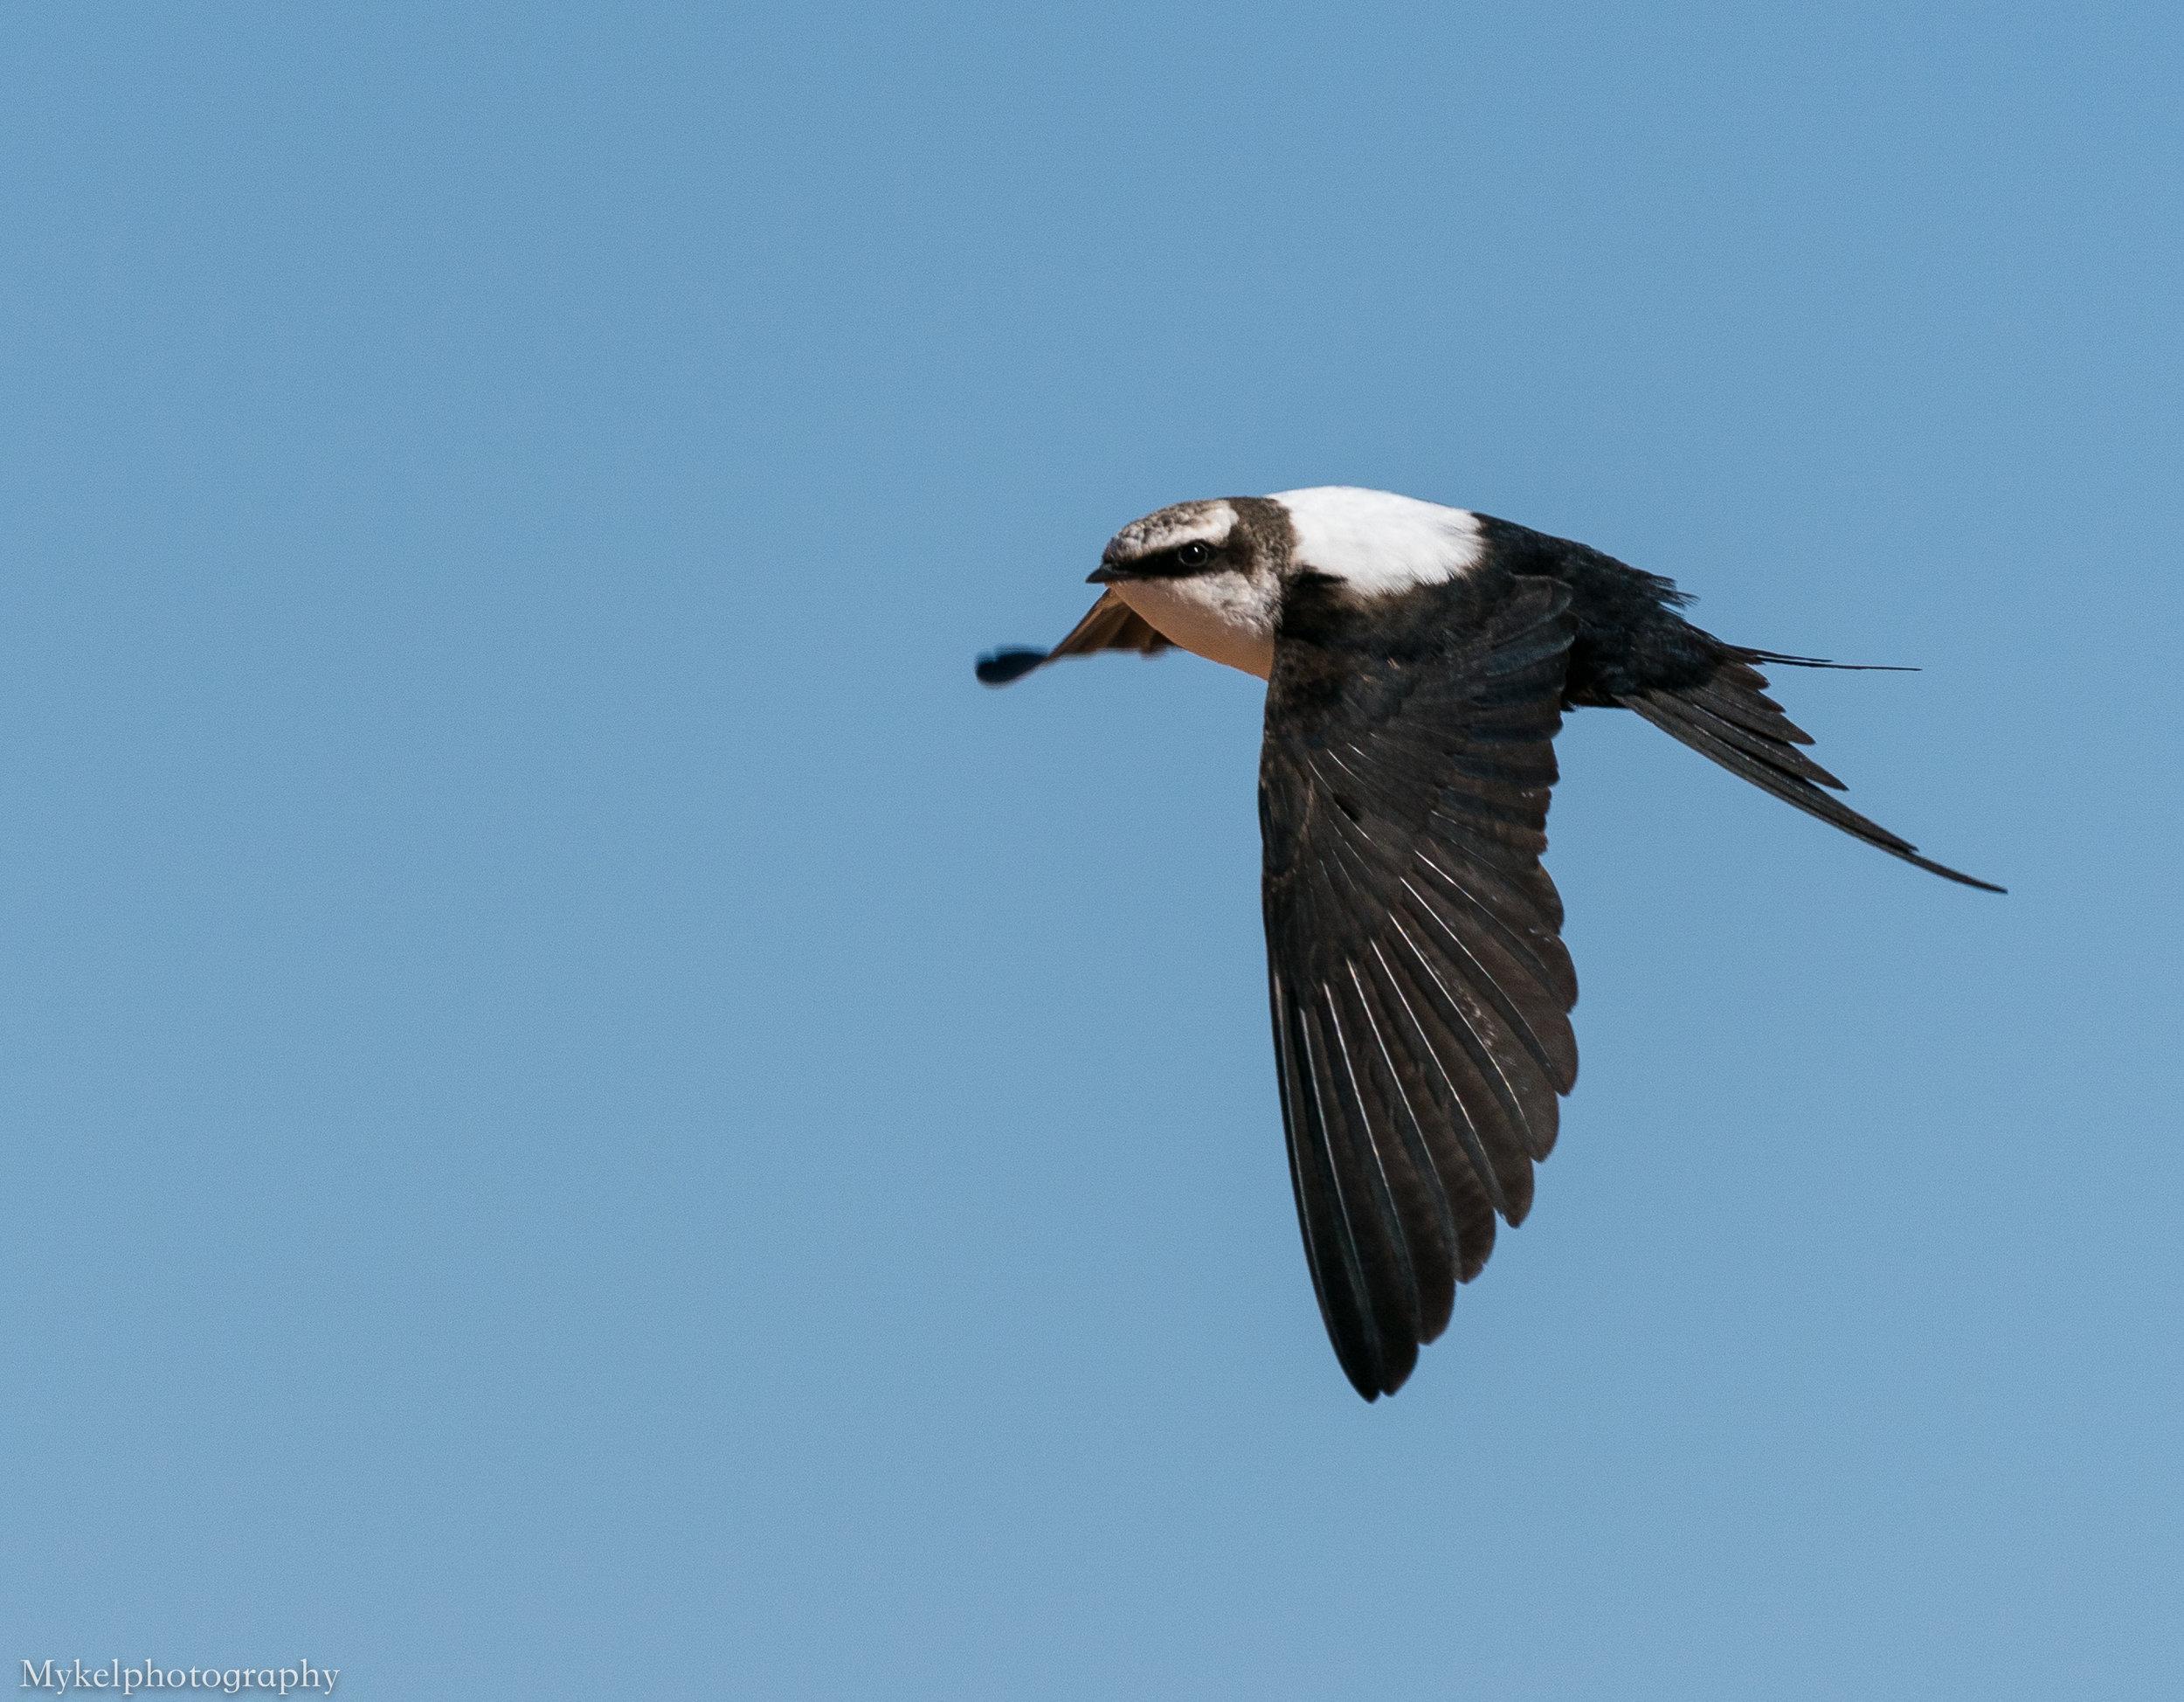 White-backed Swallow, Cheramoeca leucosterna